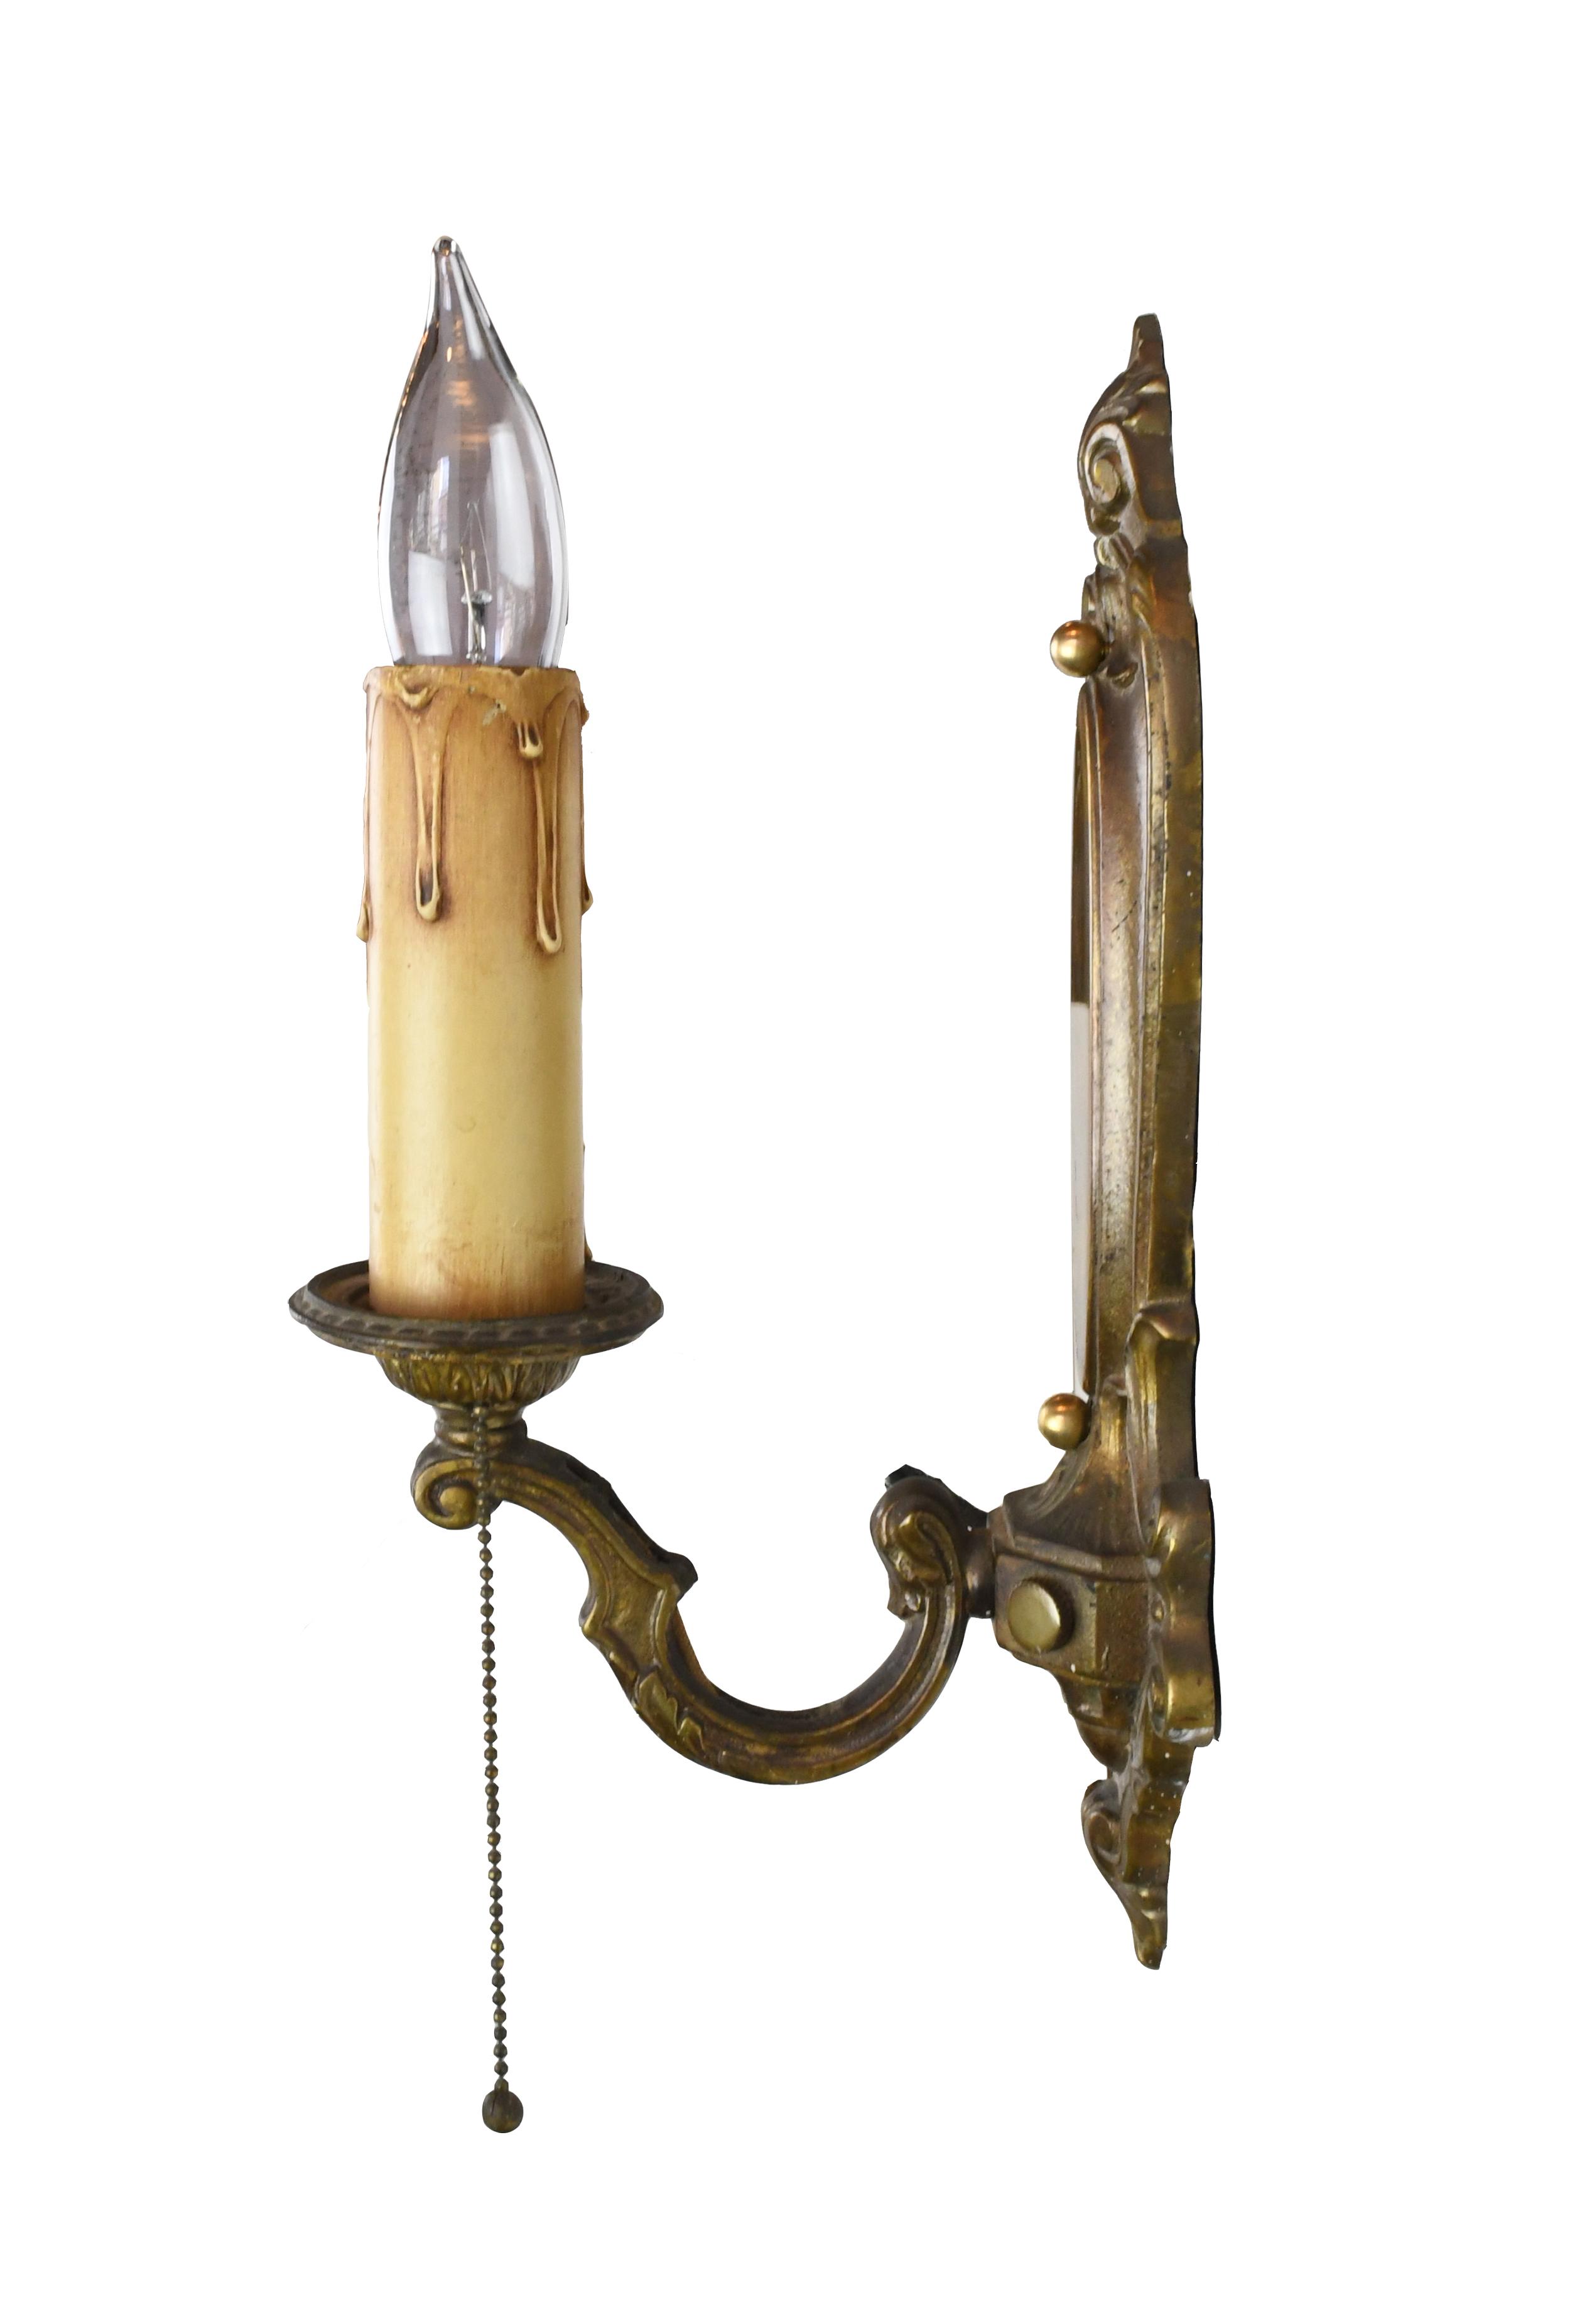 47494-beaux-arts-cast-brass-single-candle-sconce-side-1.jpg